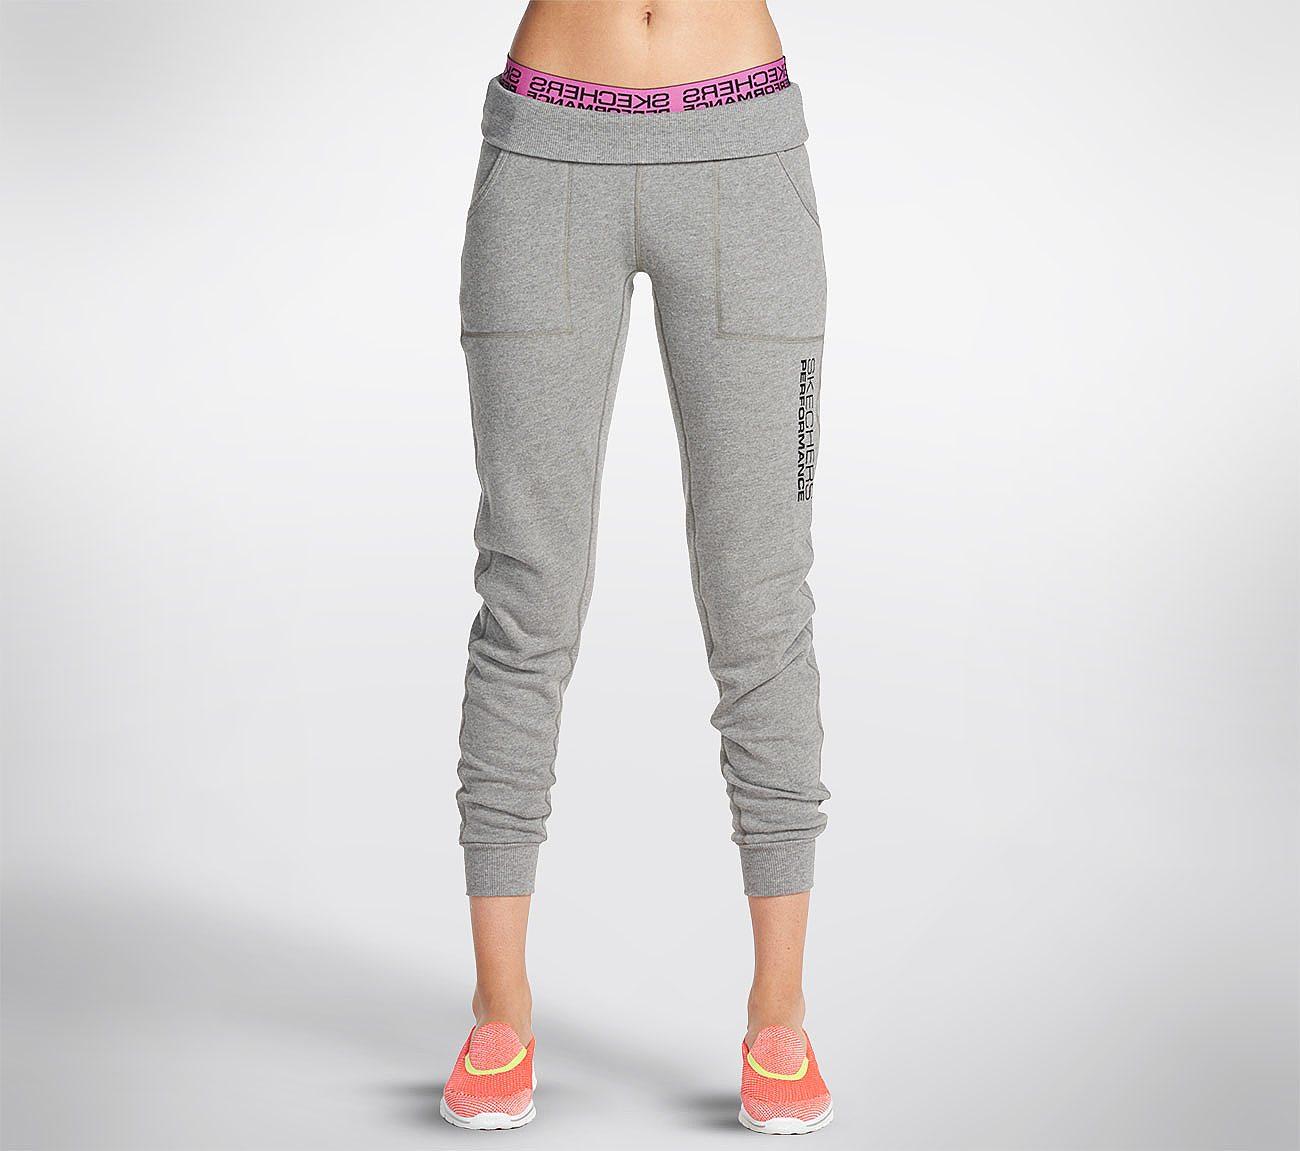 Fleece Active Joggers Elastic Pants Get What You Want Sweatpants for Boys /& Girls